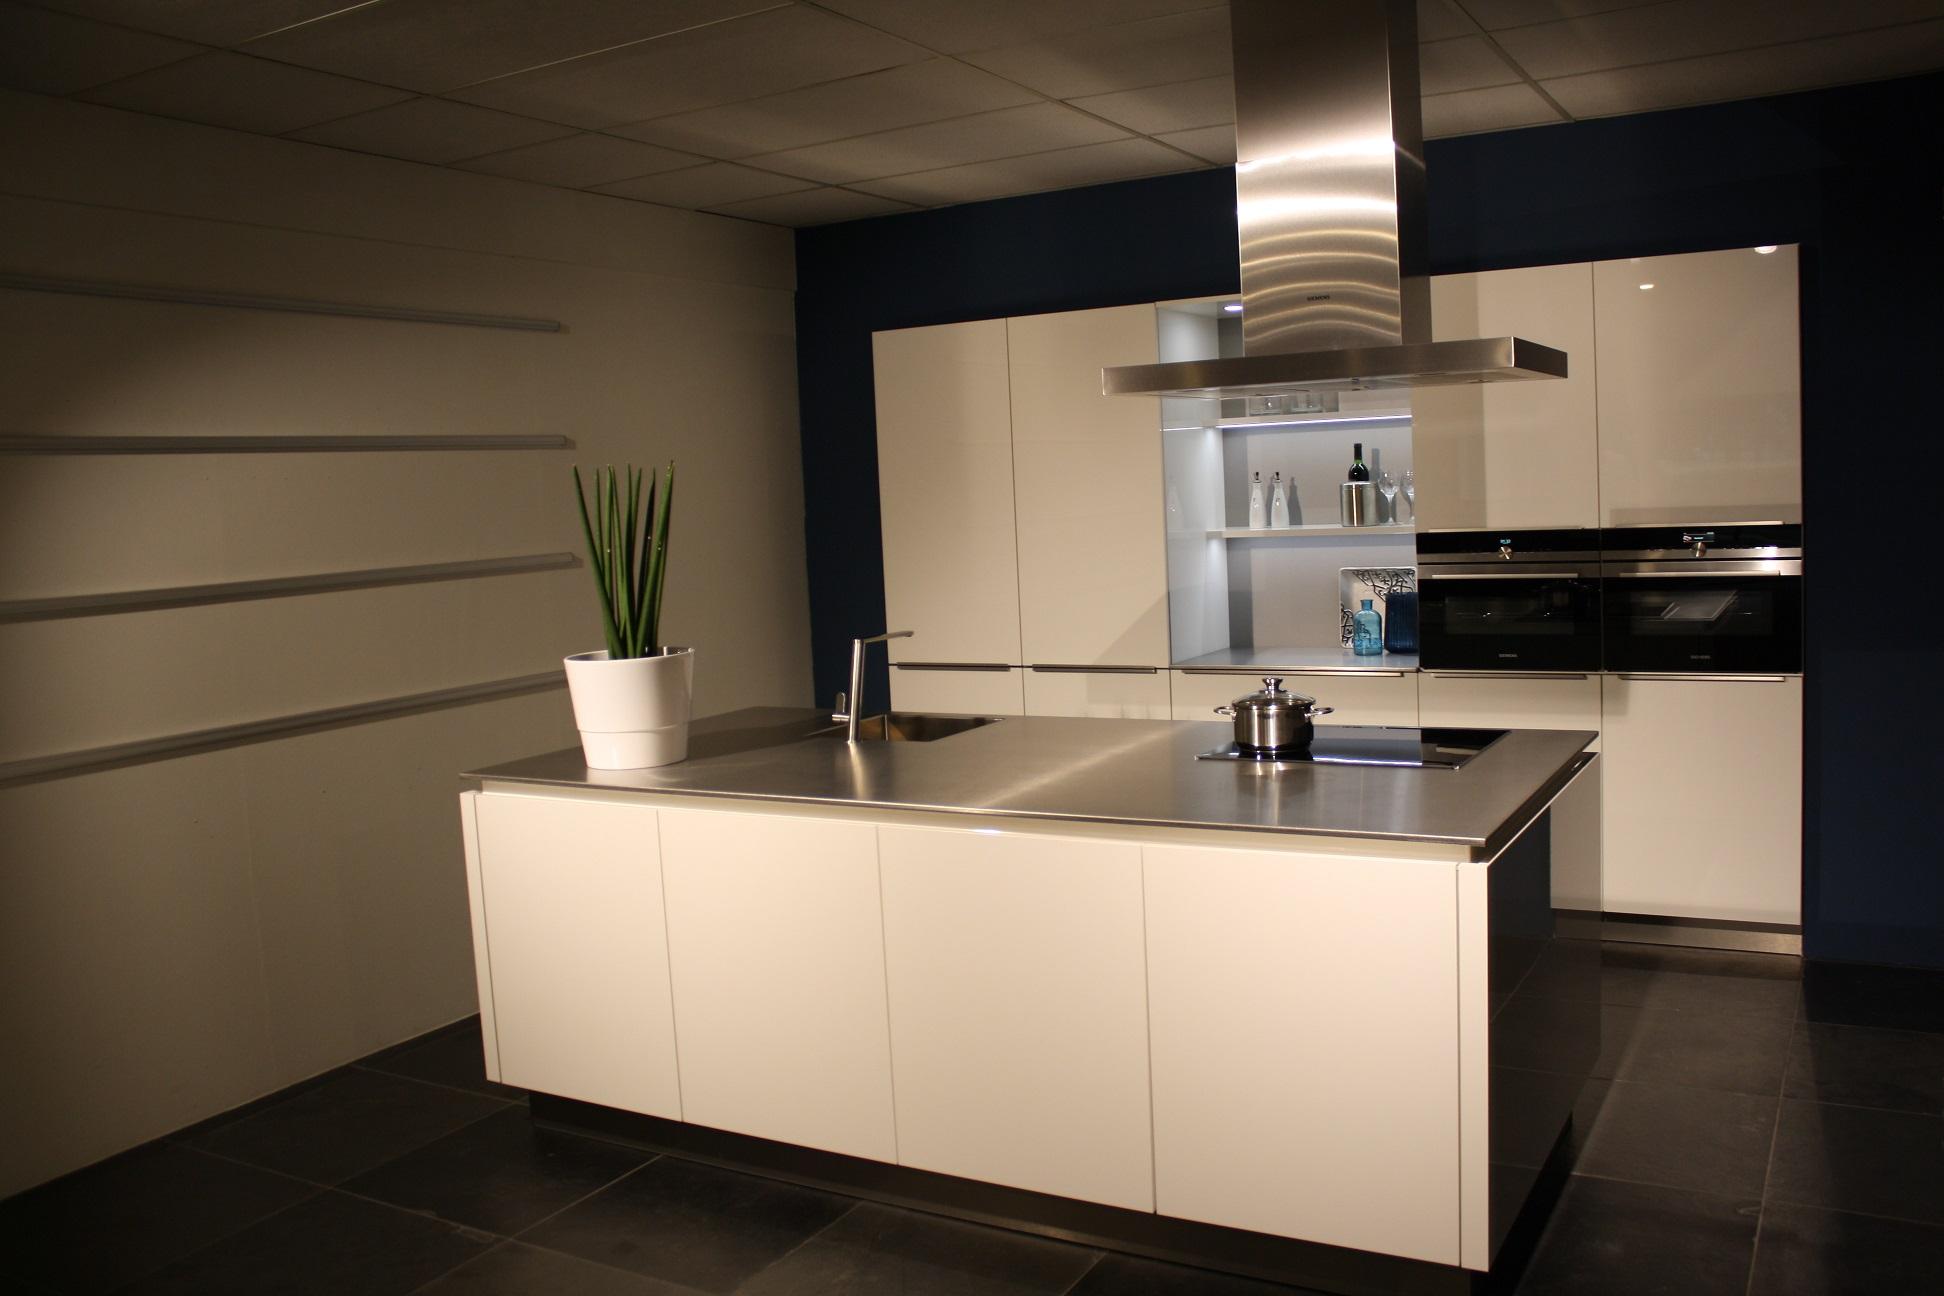 Hoogglans Wit Keuken : Eiland keuken hoogglans wit bkb keukens